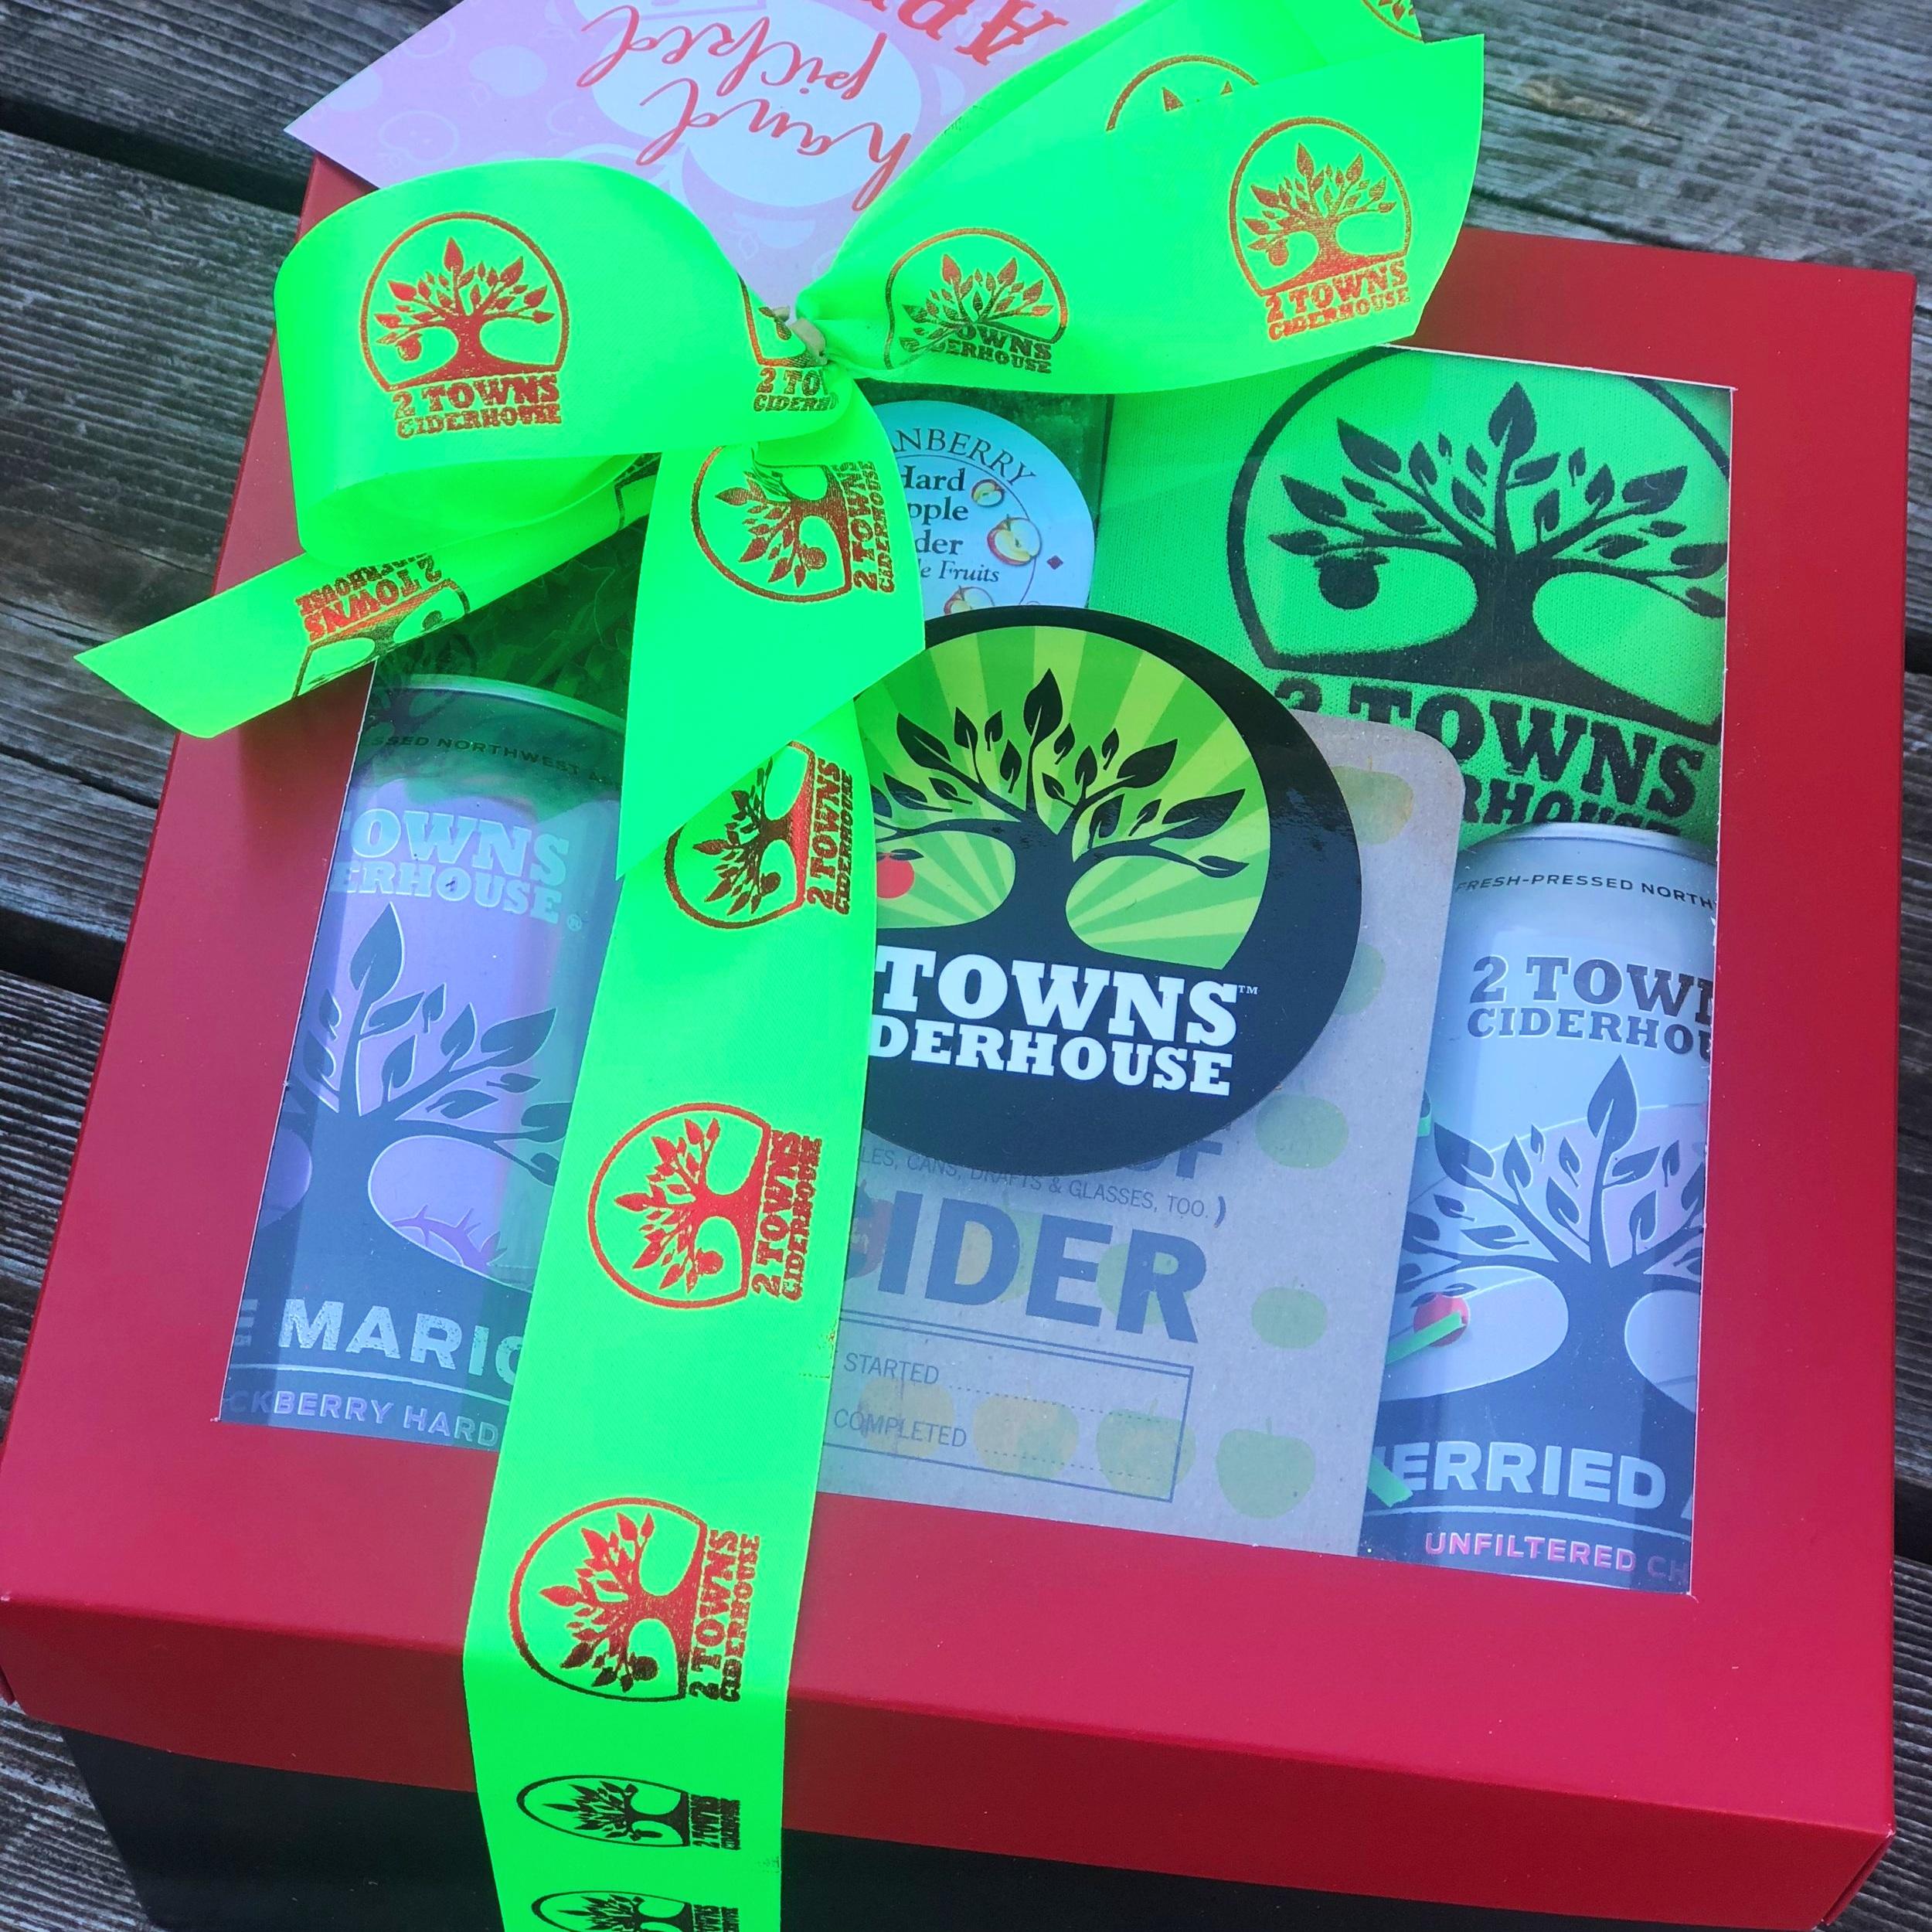 2+towns+cider+window+box.jpg